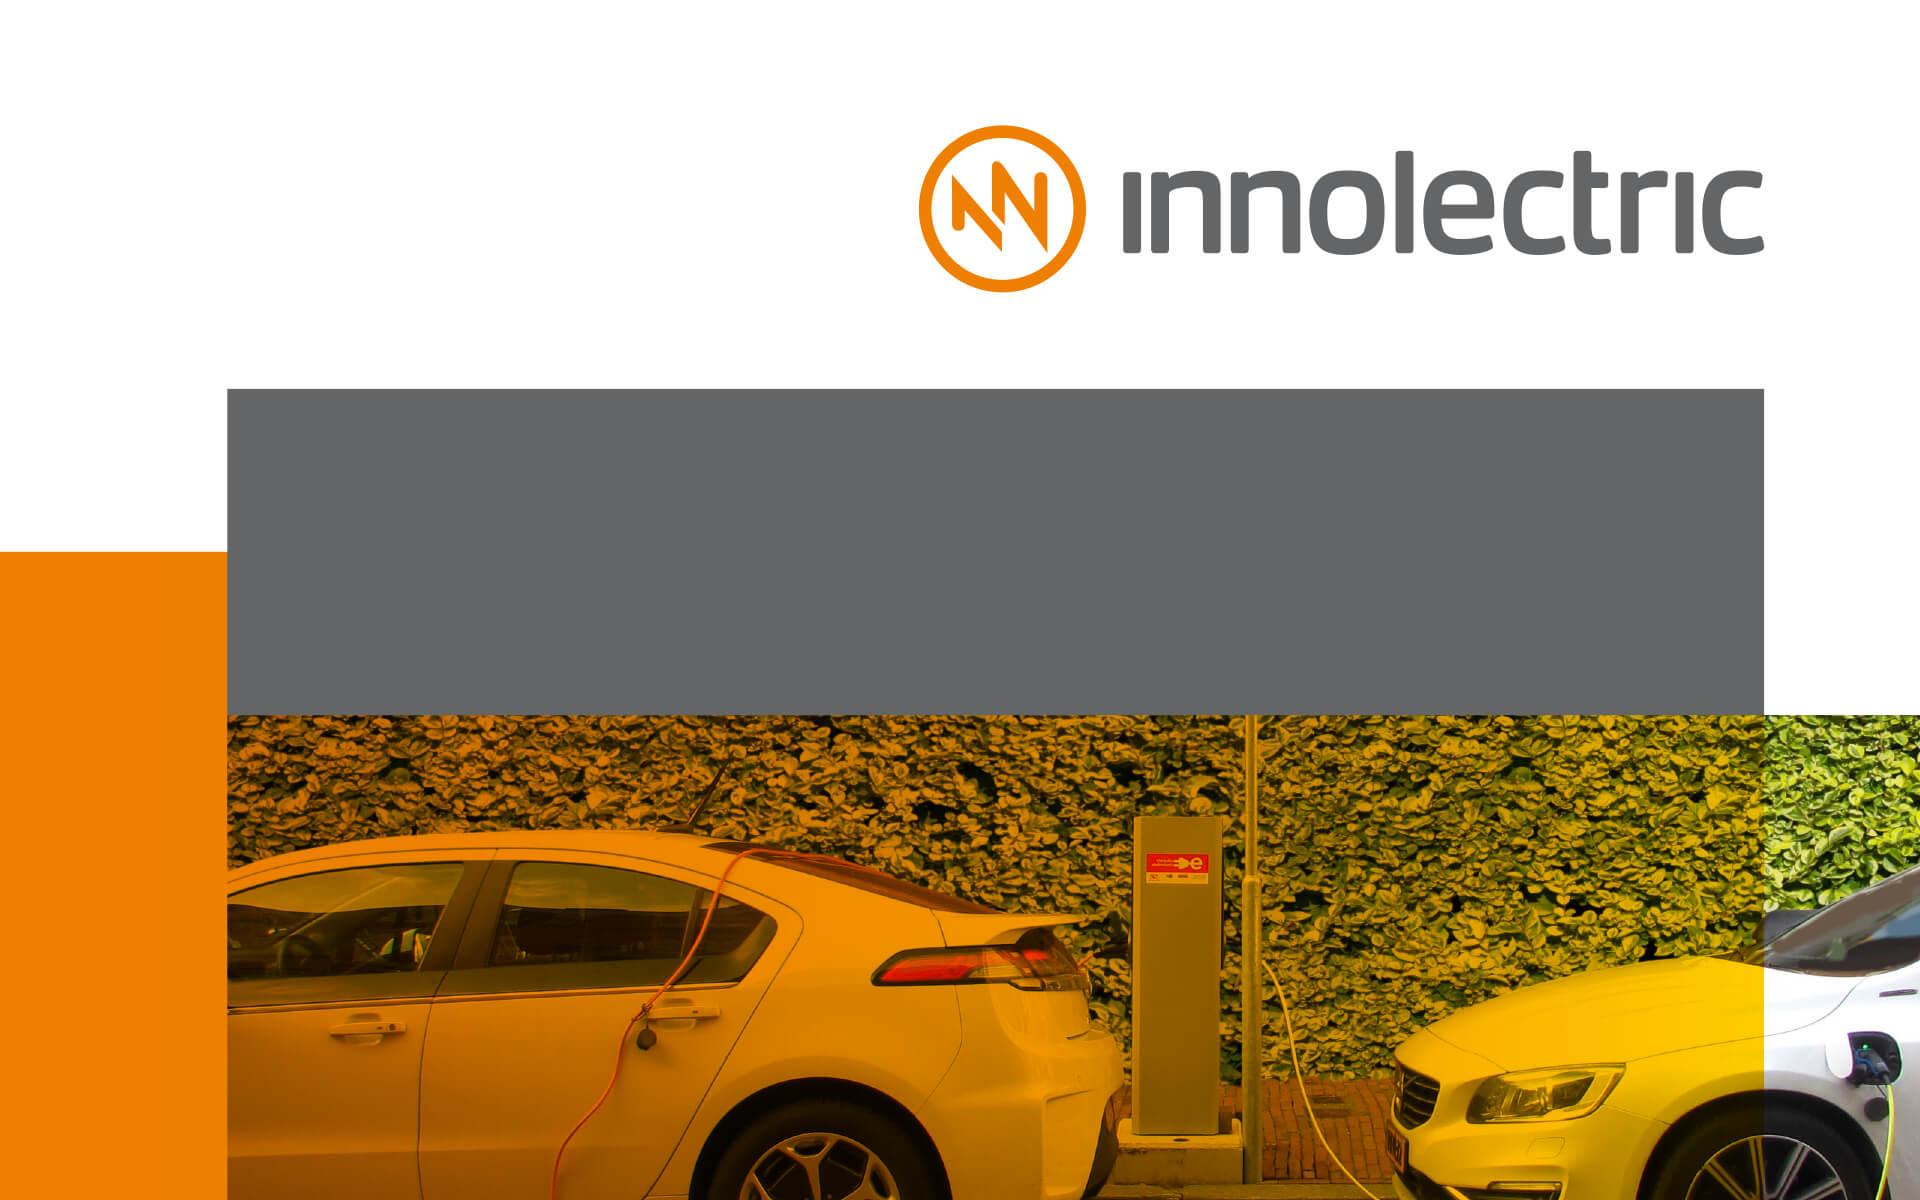 innolectric Corporate Design, Layouttektonik